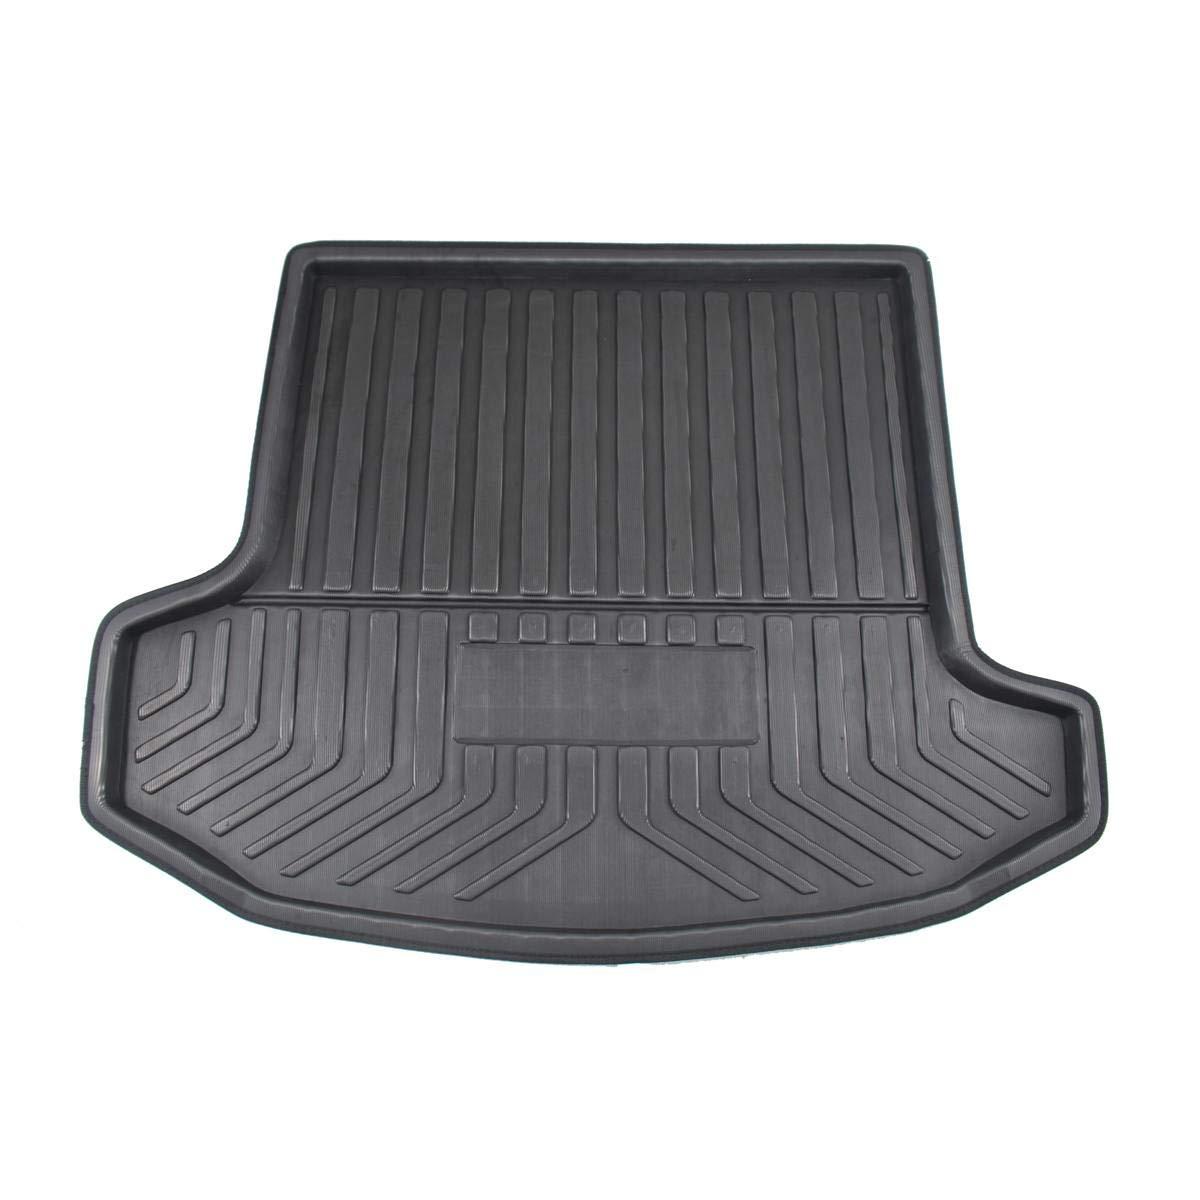 RASOME Car Cargo Liner Boot Tray Cubierta del Maletero Trasero Matt Mat Floor Carpet Kick Pad para Skoda Kodiaq 5//7 Seat Seater 2017 2018 2019